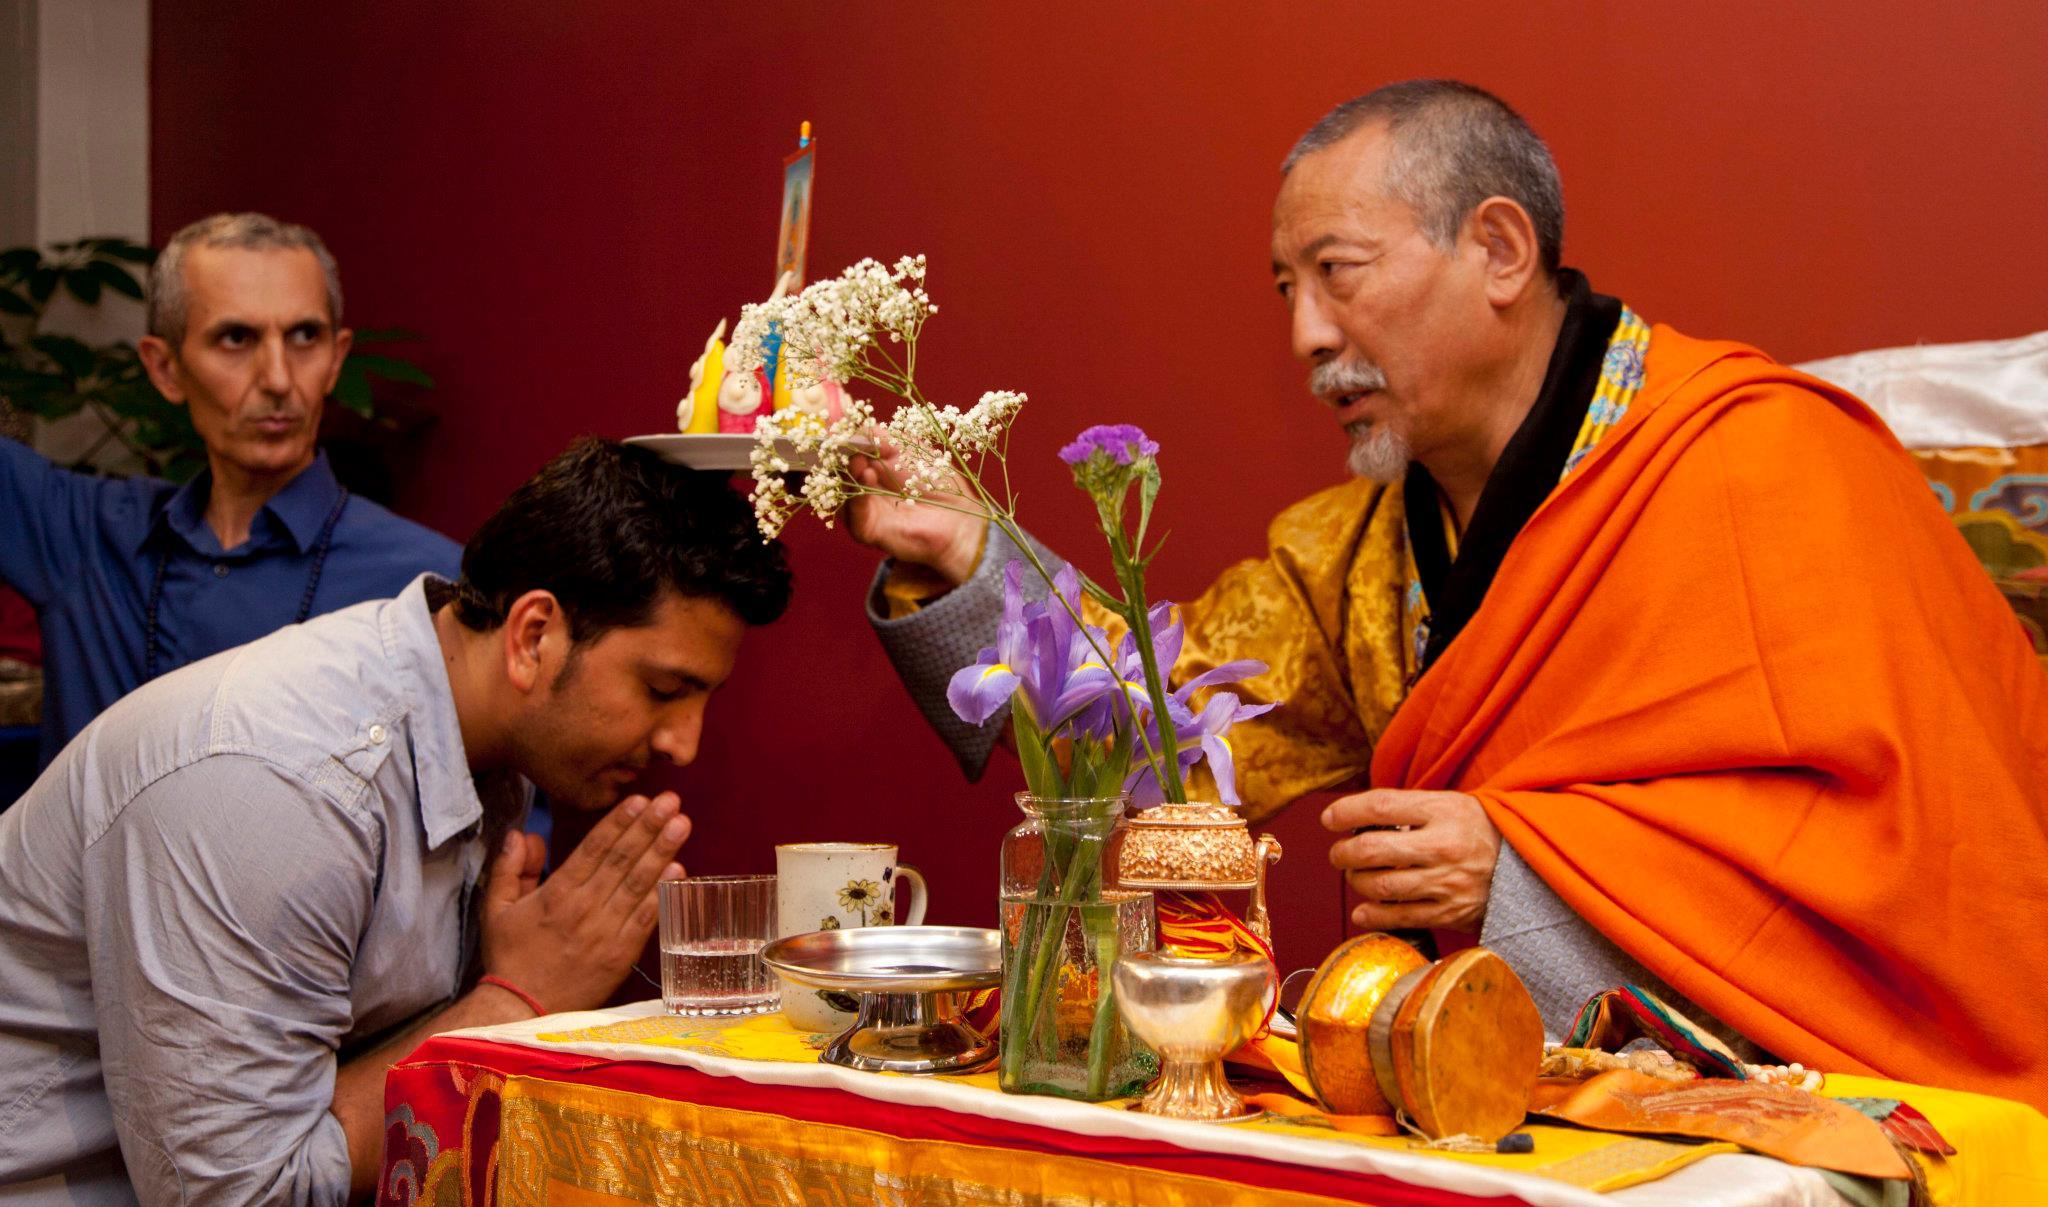 Zasep Rinpoche Medicine Buddha Toronto Sky Cave Media 2012 Medicine Buddha initatiation